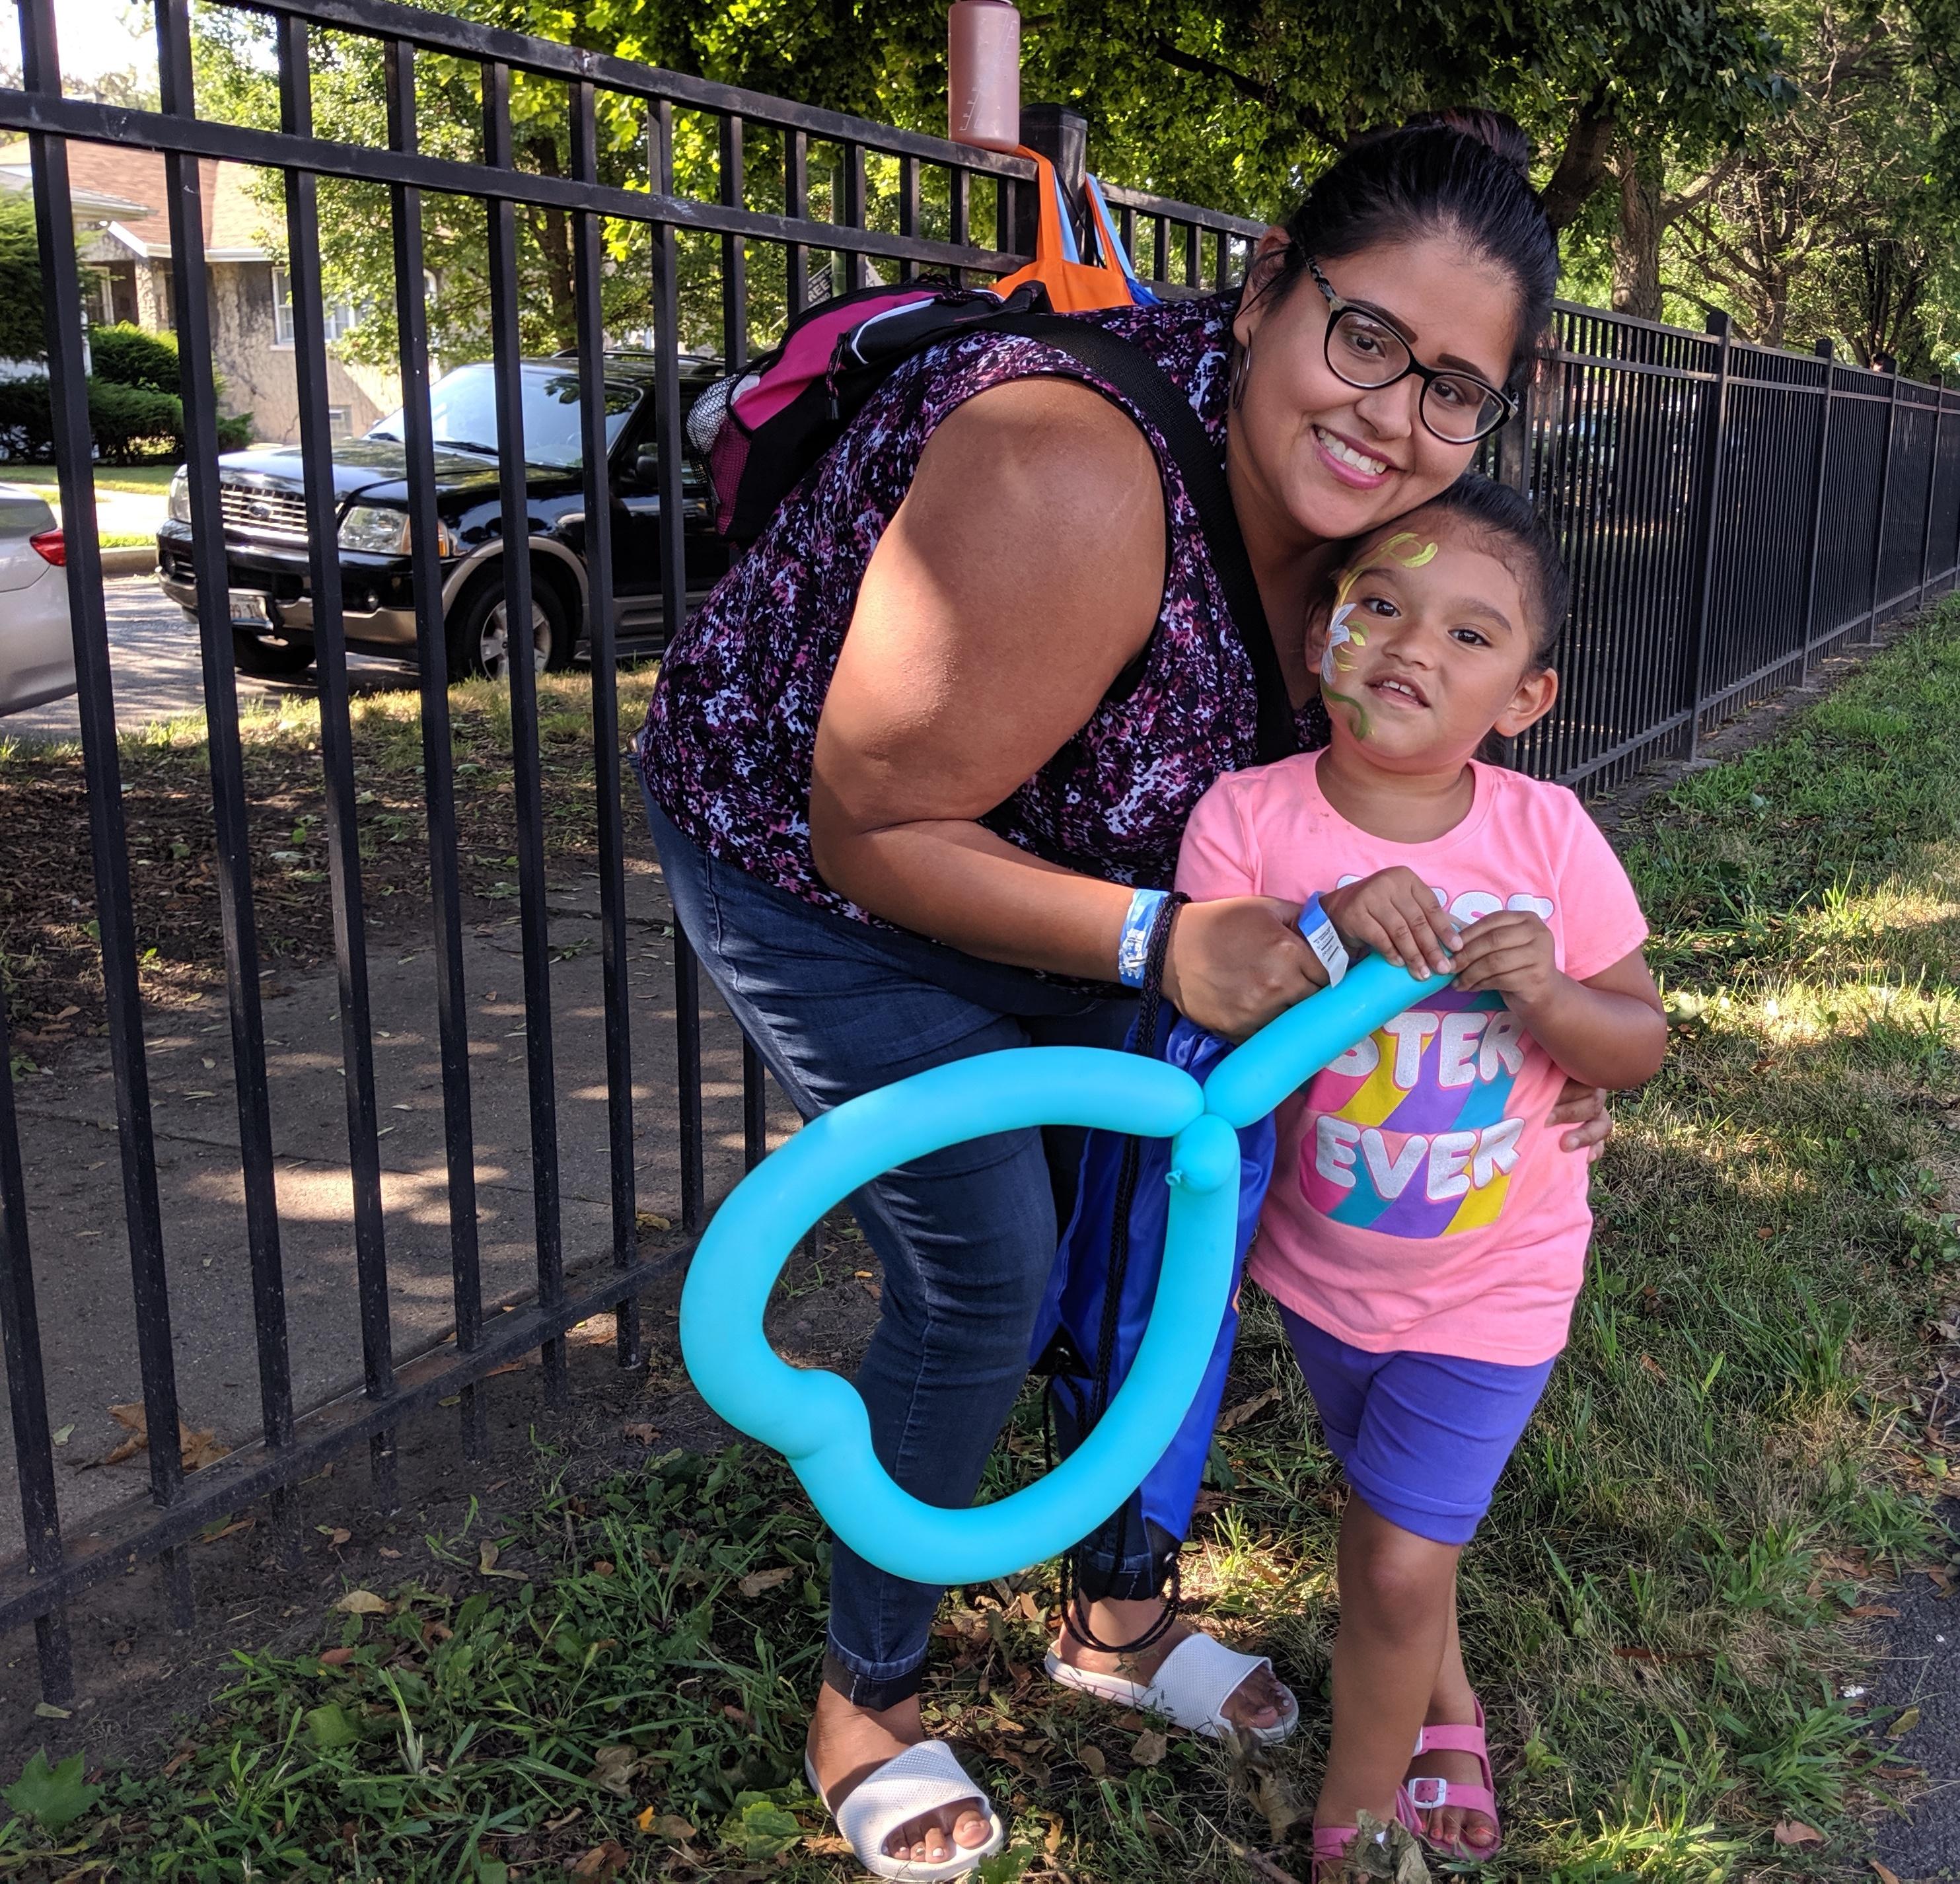 Bianca Freyre and her preschooler, Maura